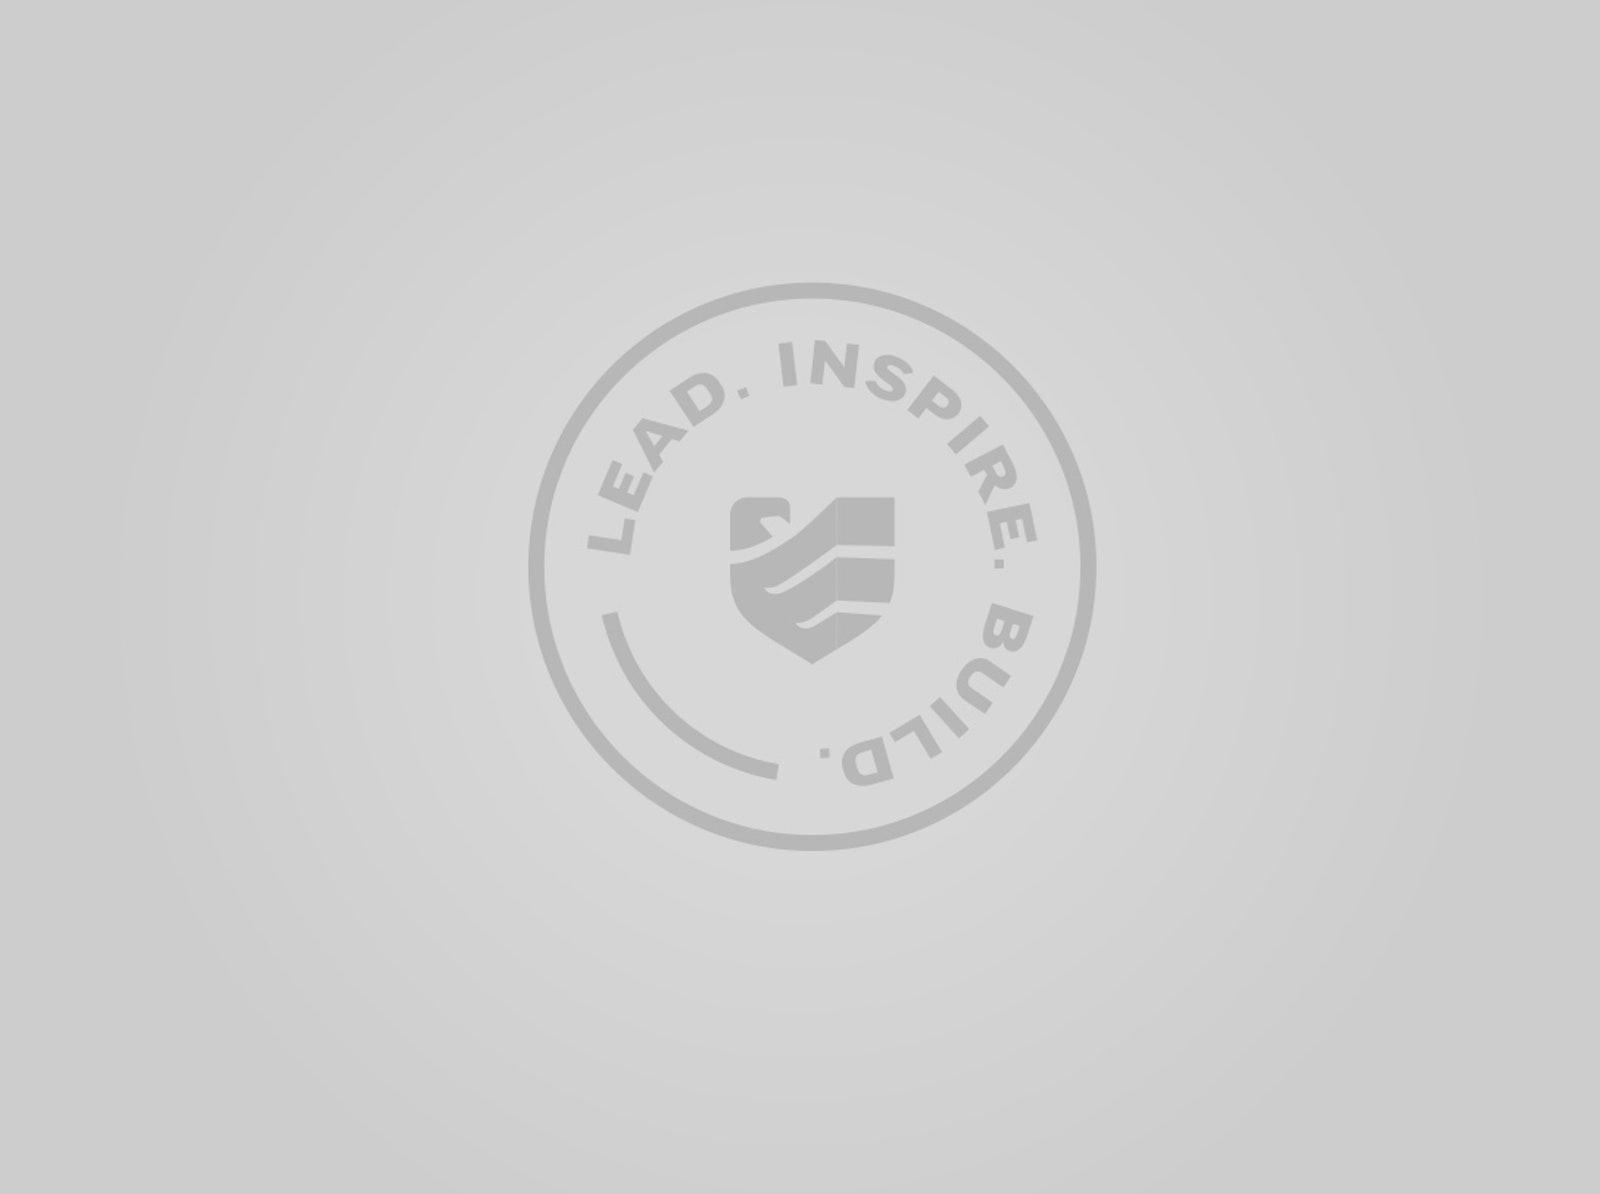 Stahl Seal